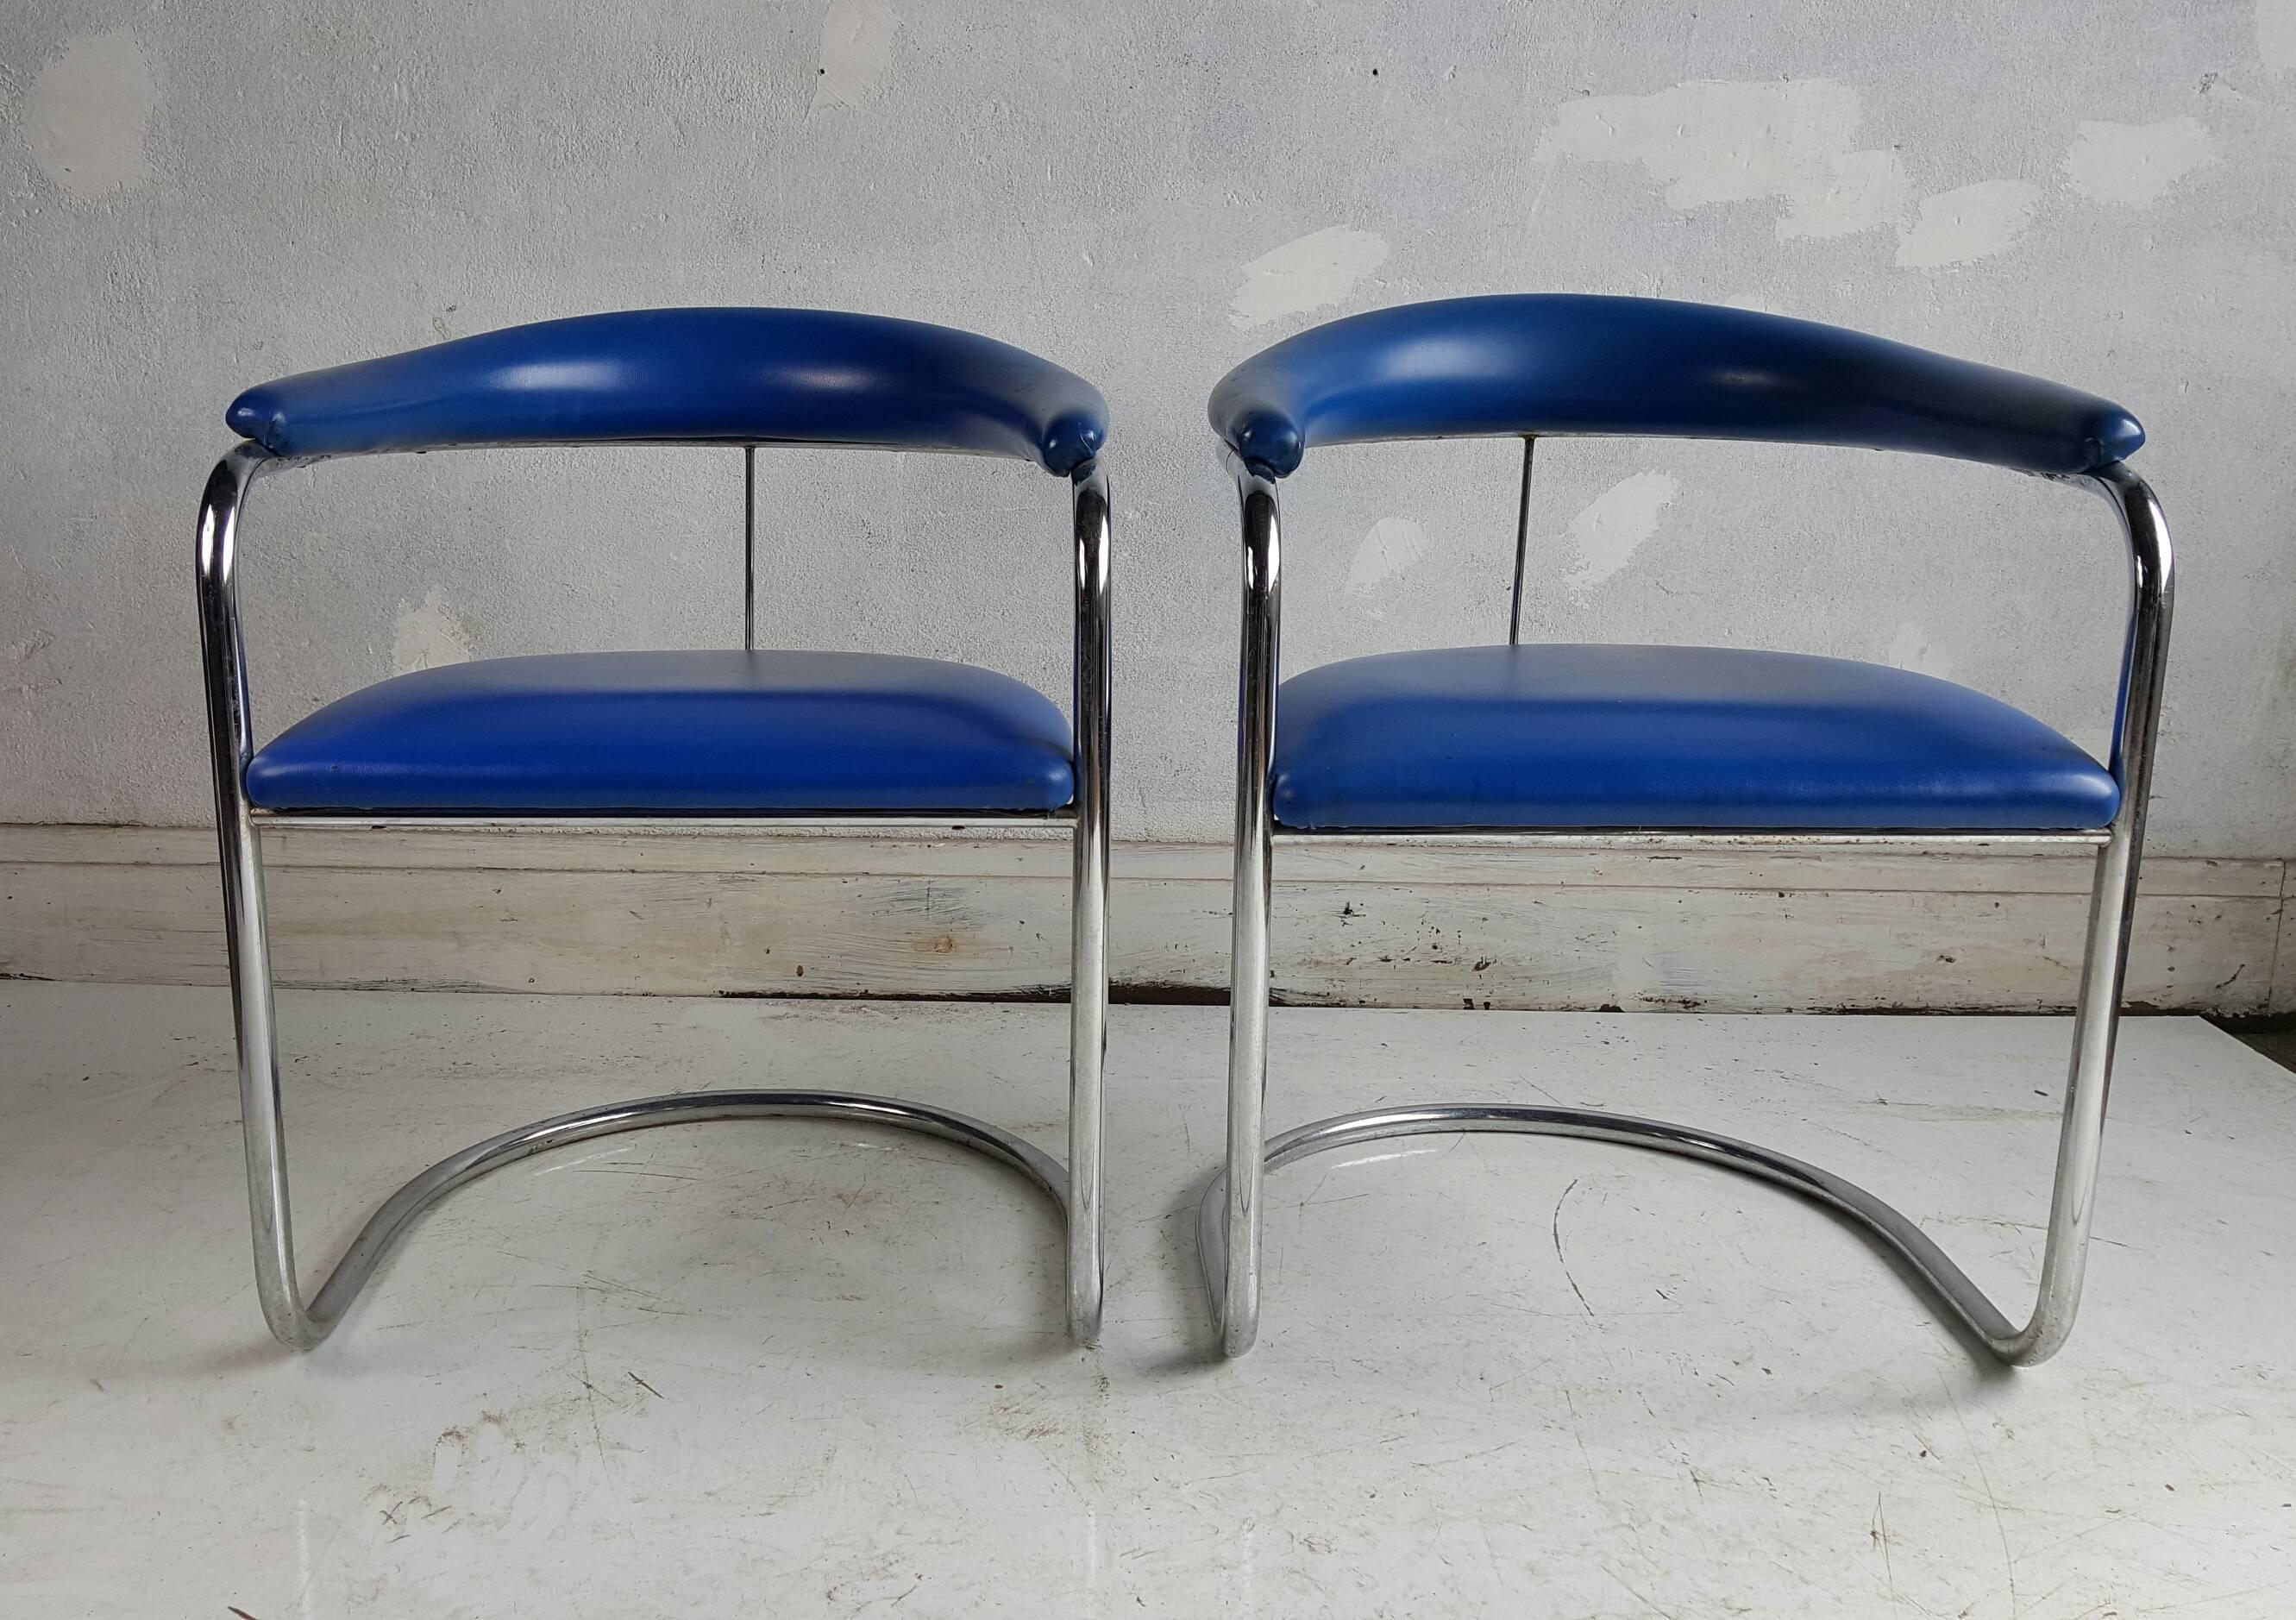 Pair Of Anton Lorenz Chairs For Thonet Model SS33. Original Electric Blue  Naugahyde Upholstery,